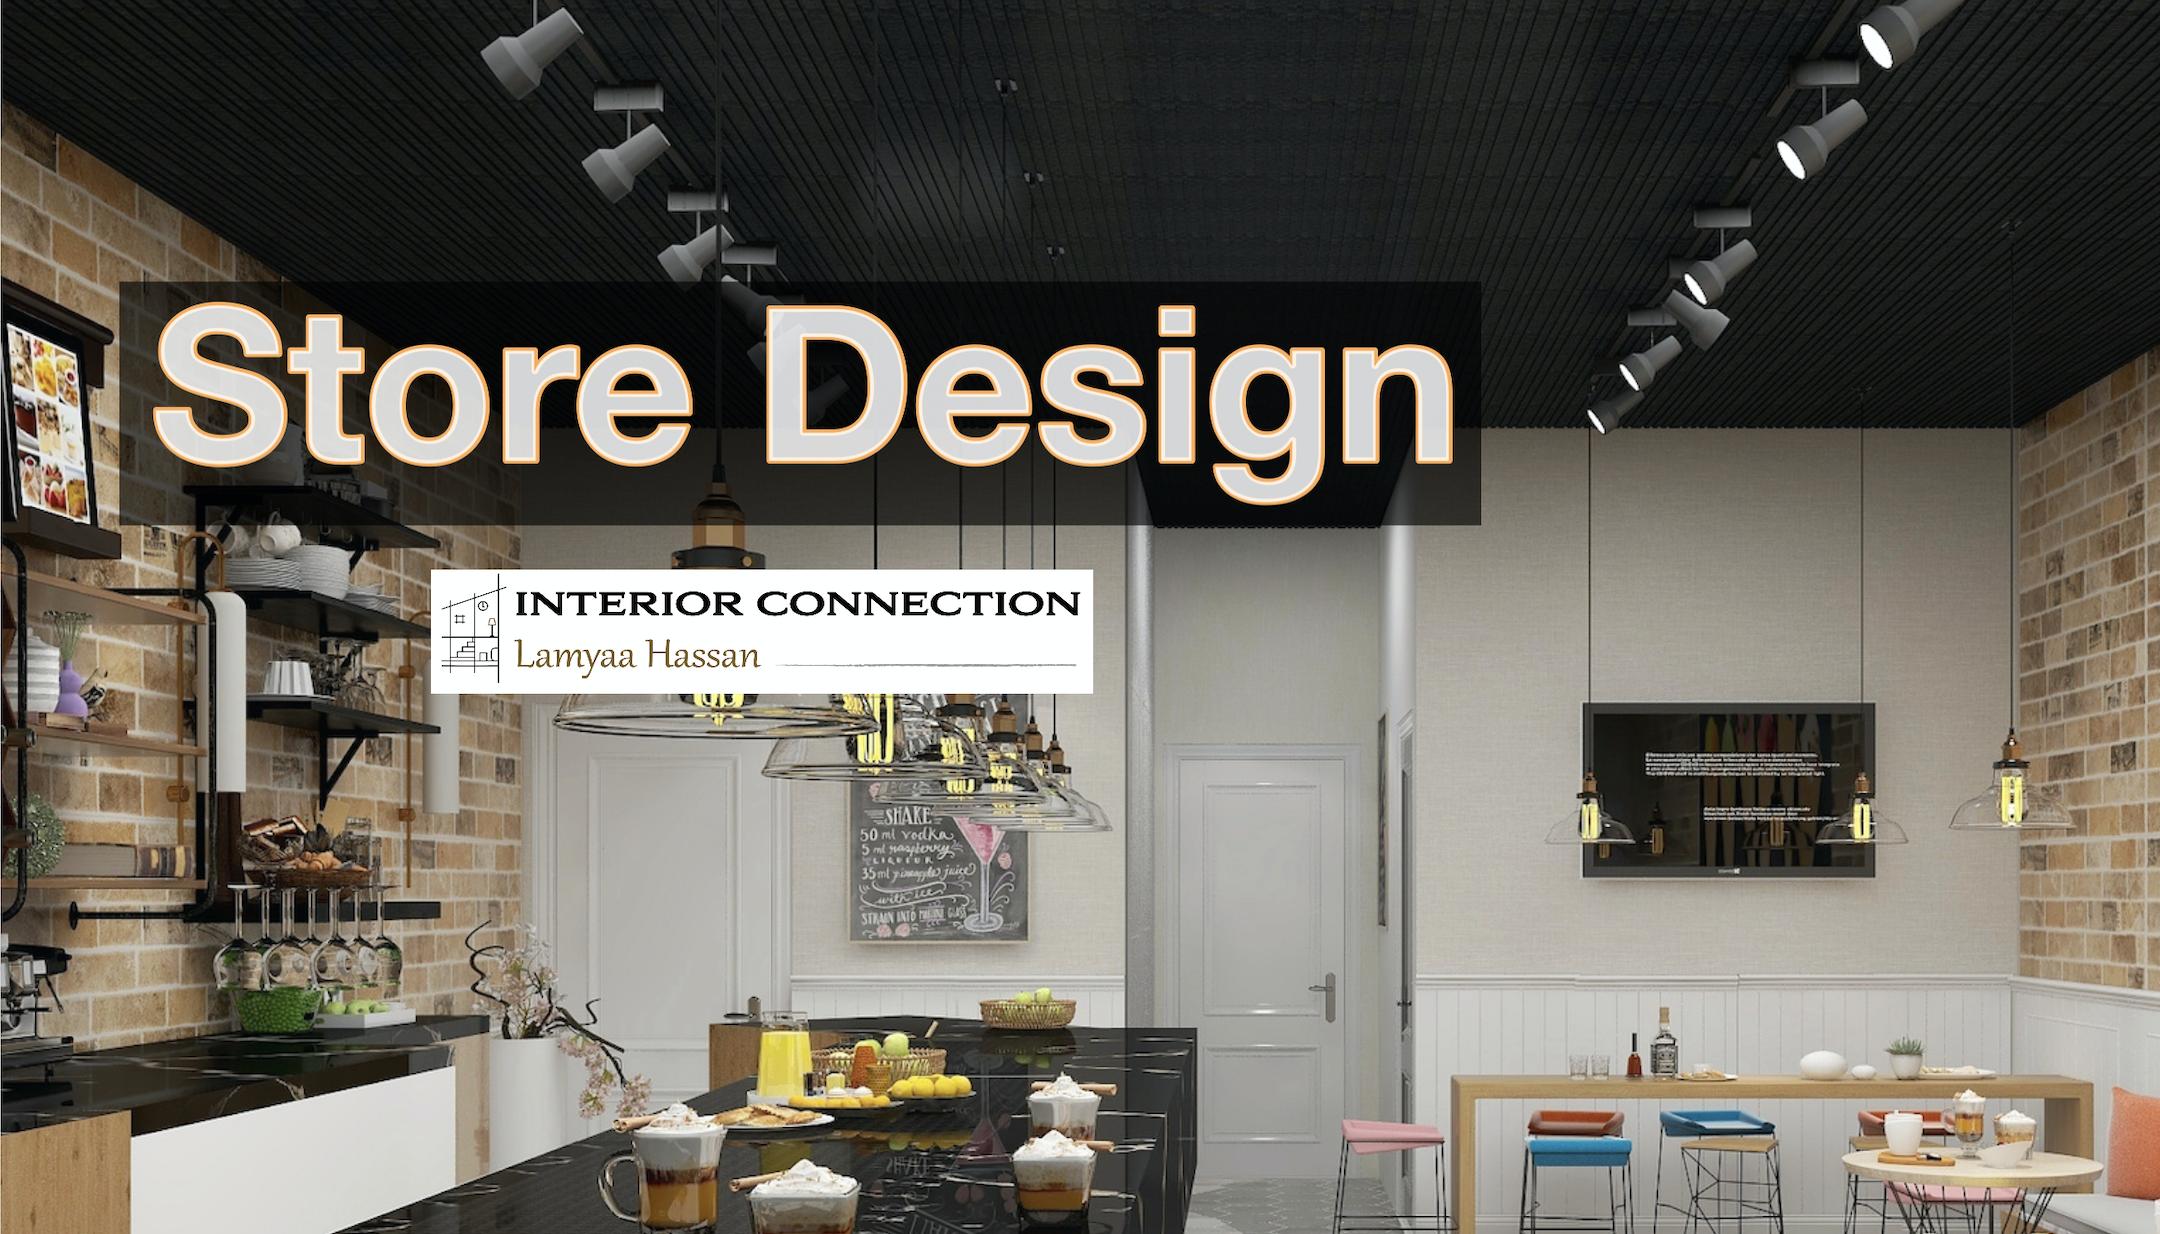 Store Design Video Store Design Interior Store Design Online Interior Design